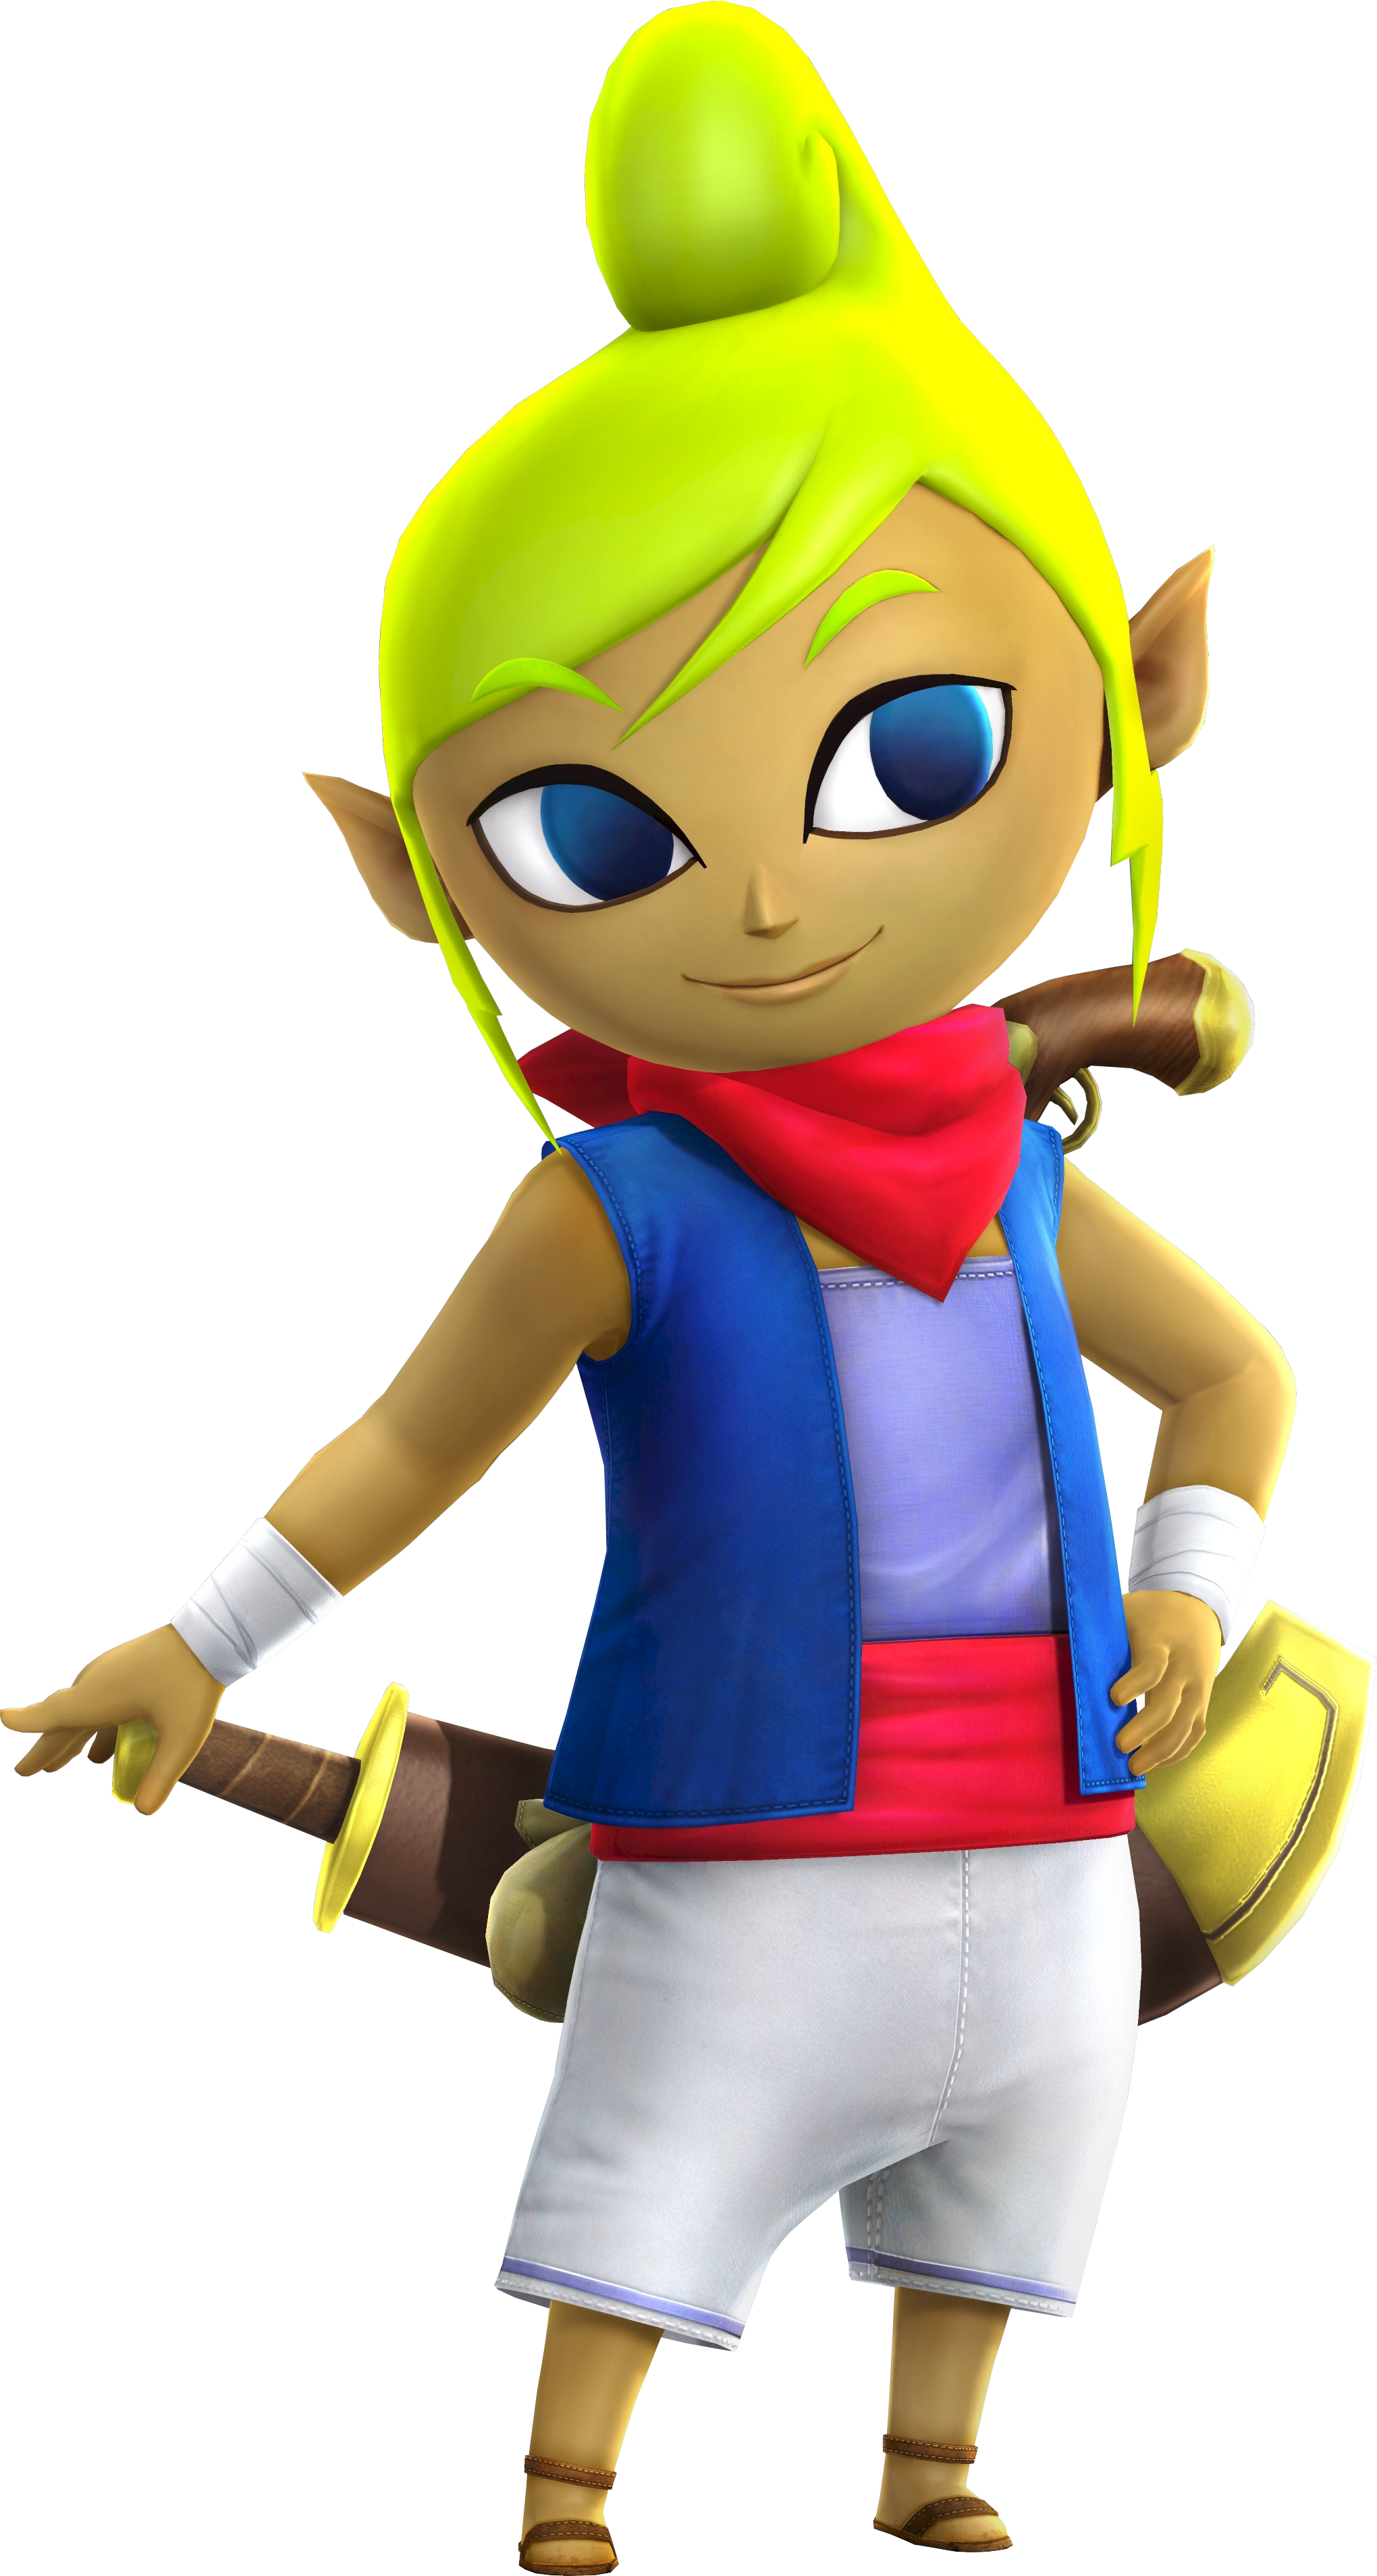 Tetra Hyrule Warriors Zeldapedia Fandom